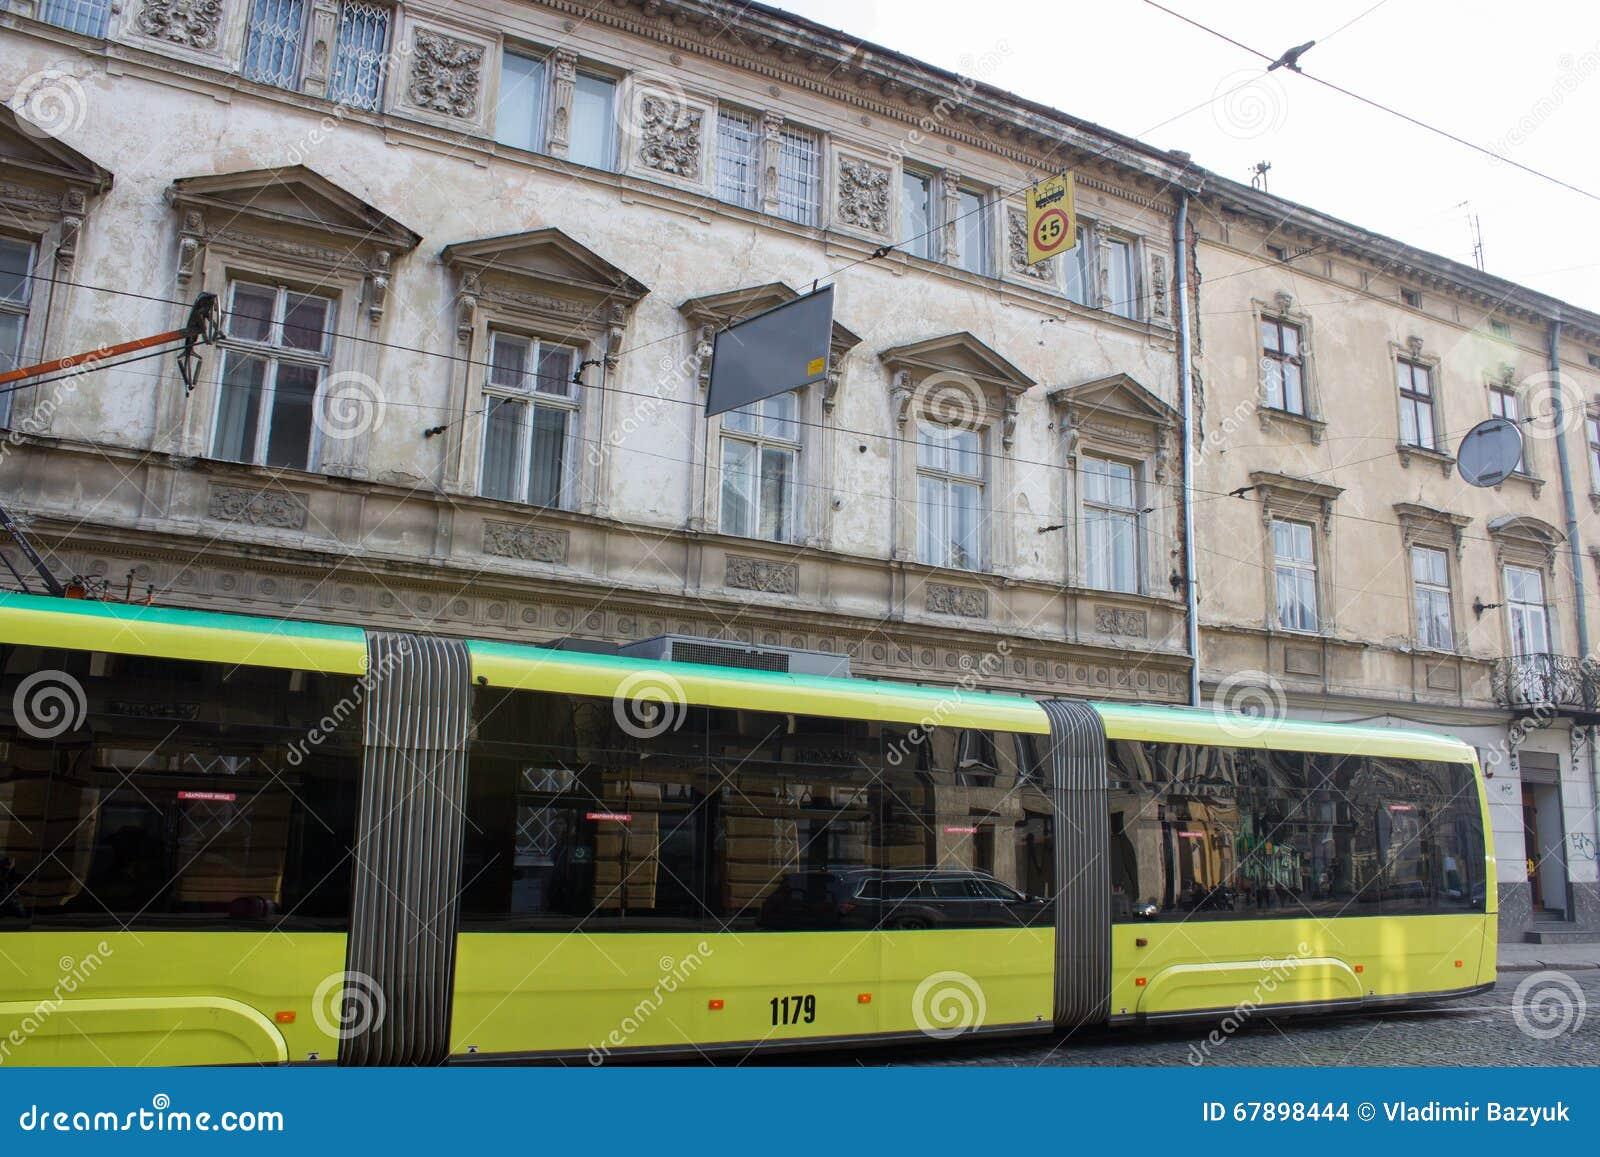 Tram moderne dans la ville